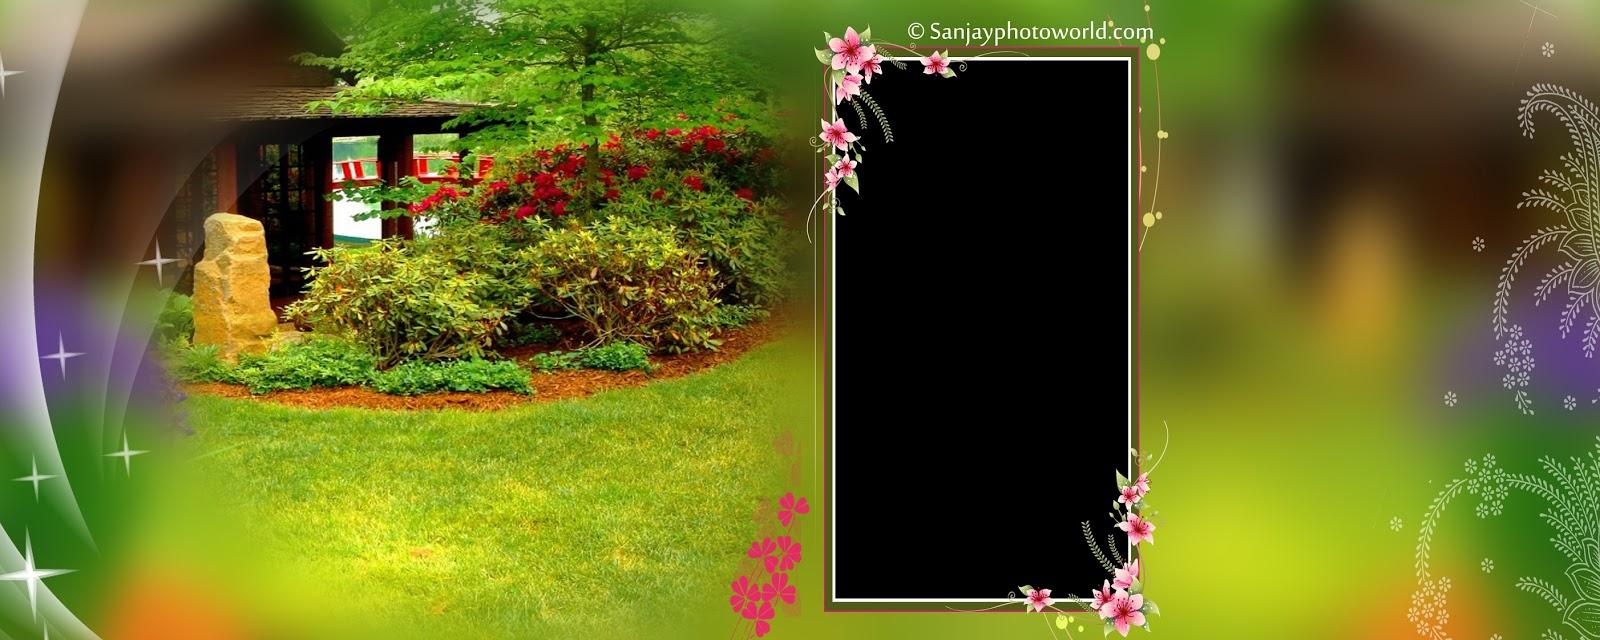 Karizma Album Psd Background 12x36 Free Download - StudioPk